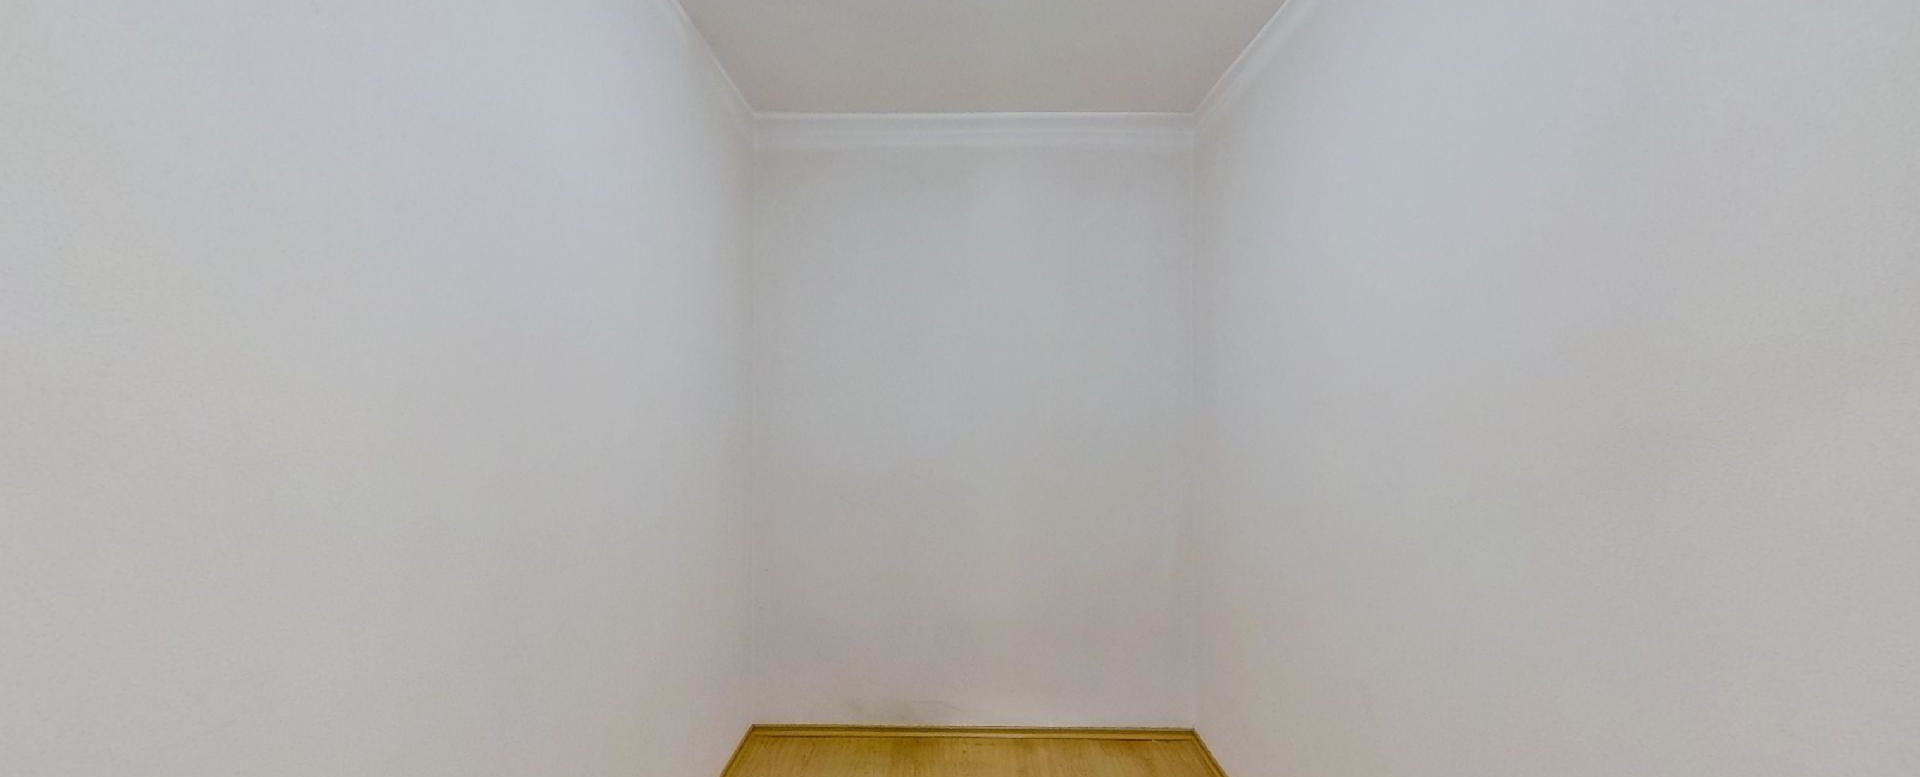 Šatník Obývacia izba s kuchynskou linkou v 2-izbovom byte na ulici Jana Kráľa v Čadci